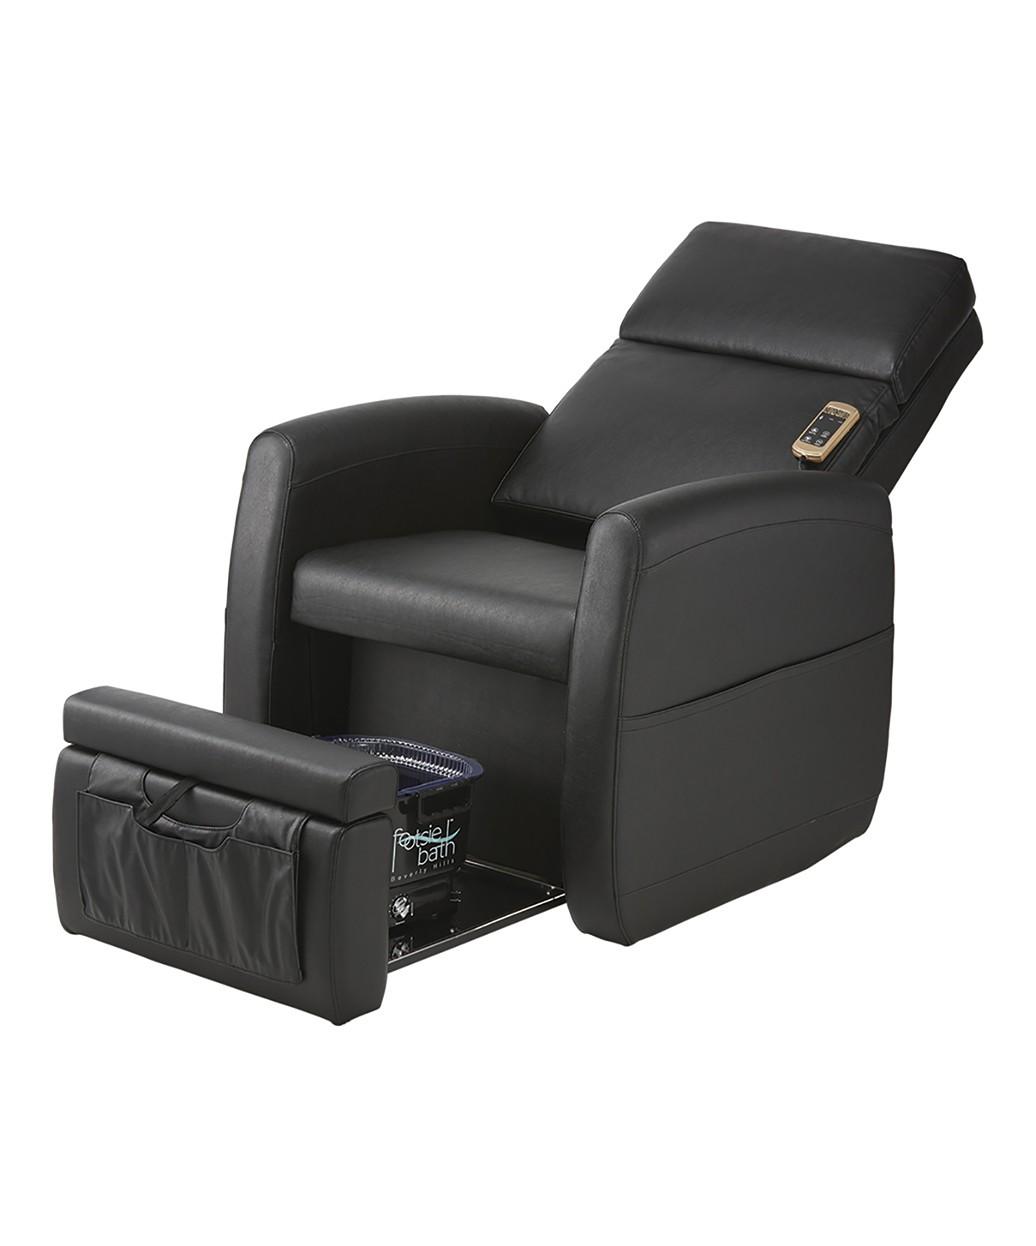 Pibbs Ps9 Plumbing Free Massage Pedicure Chair Buy Rite